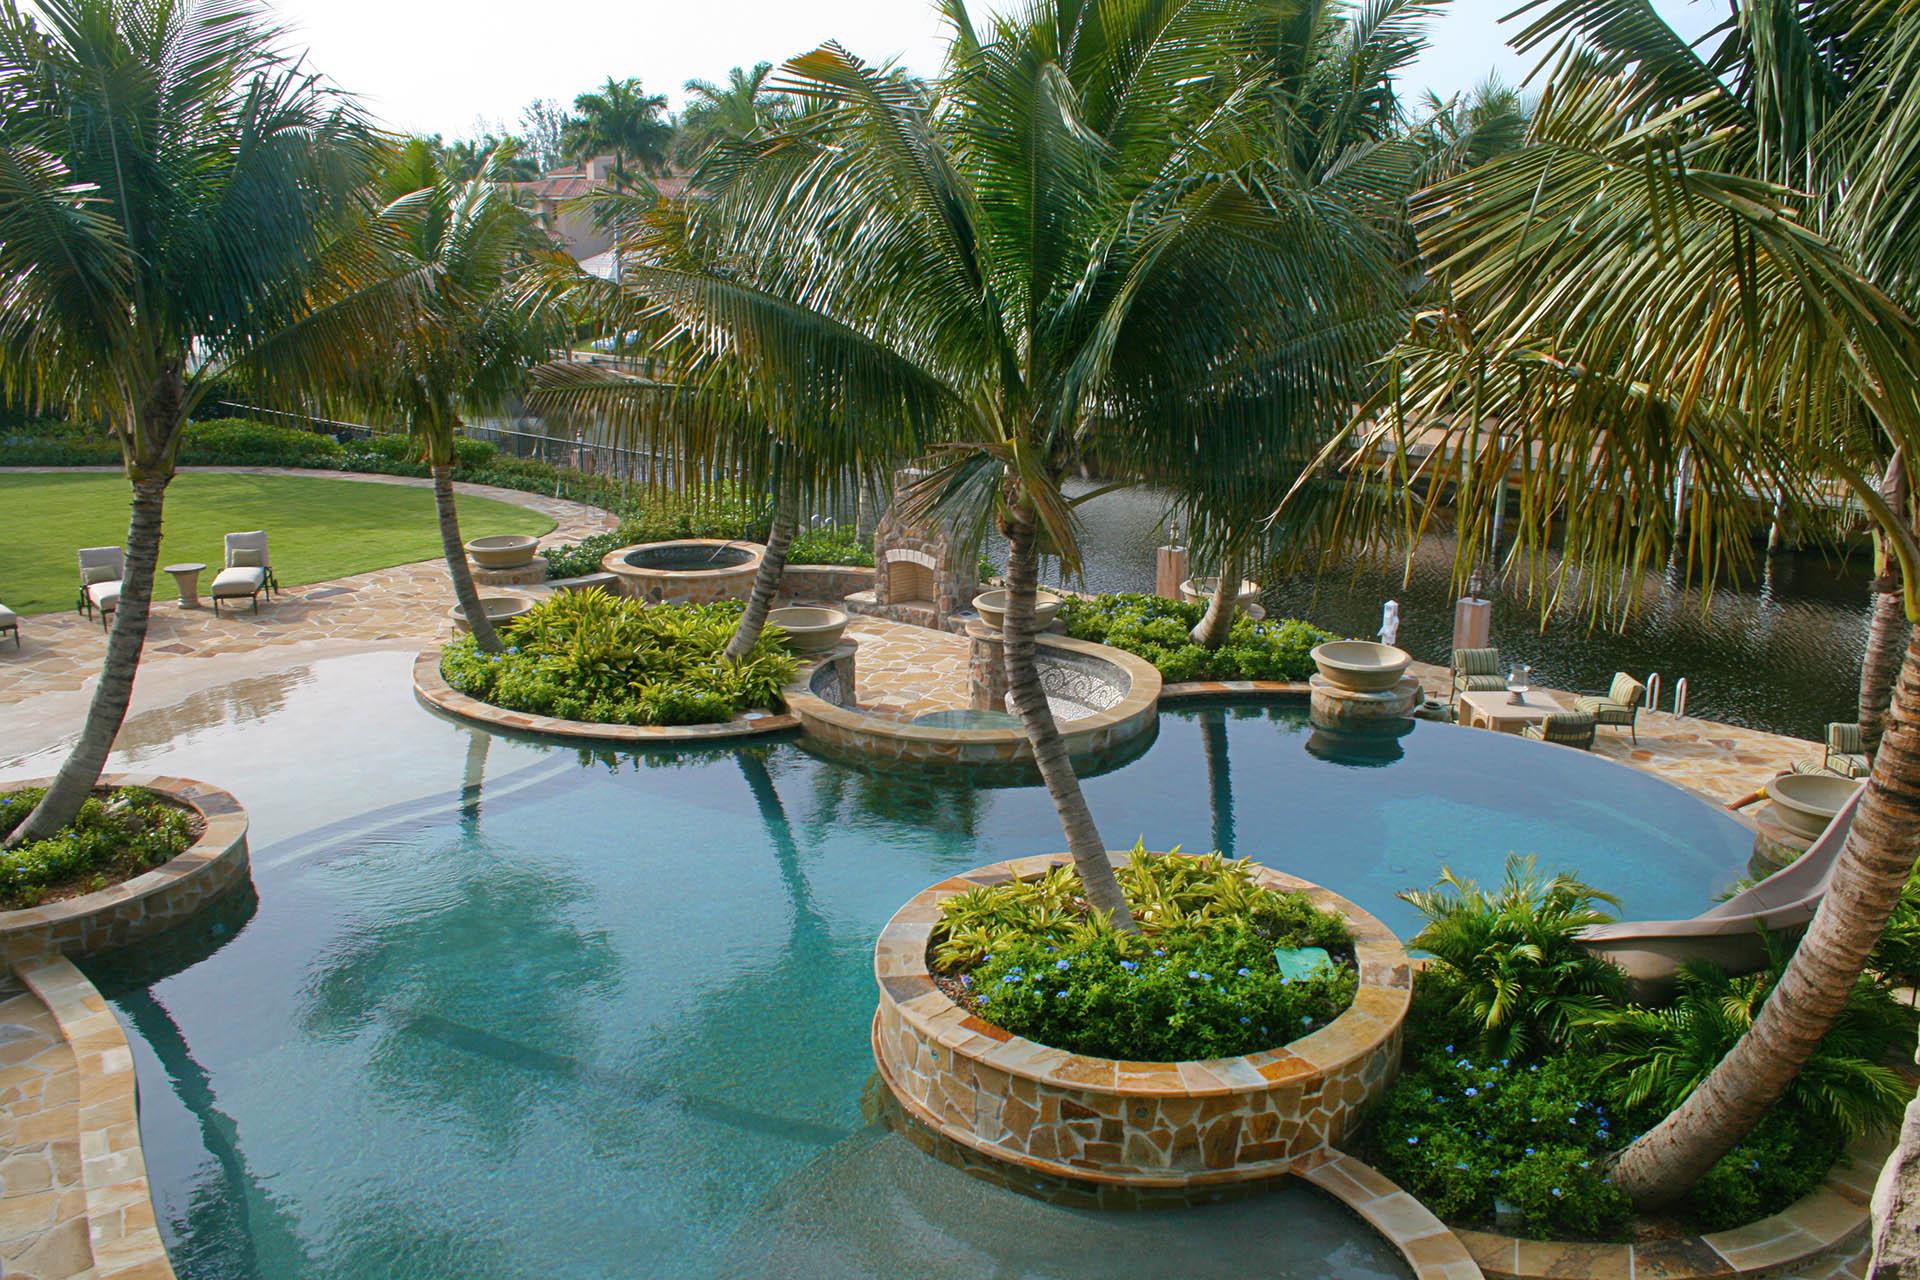 Swimming Pool Spa Water Slide - Boca Raton